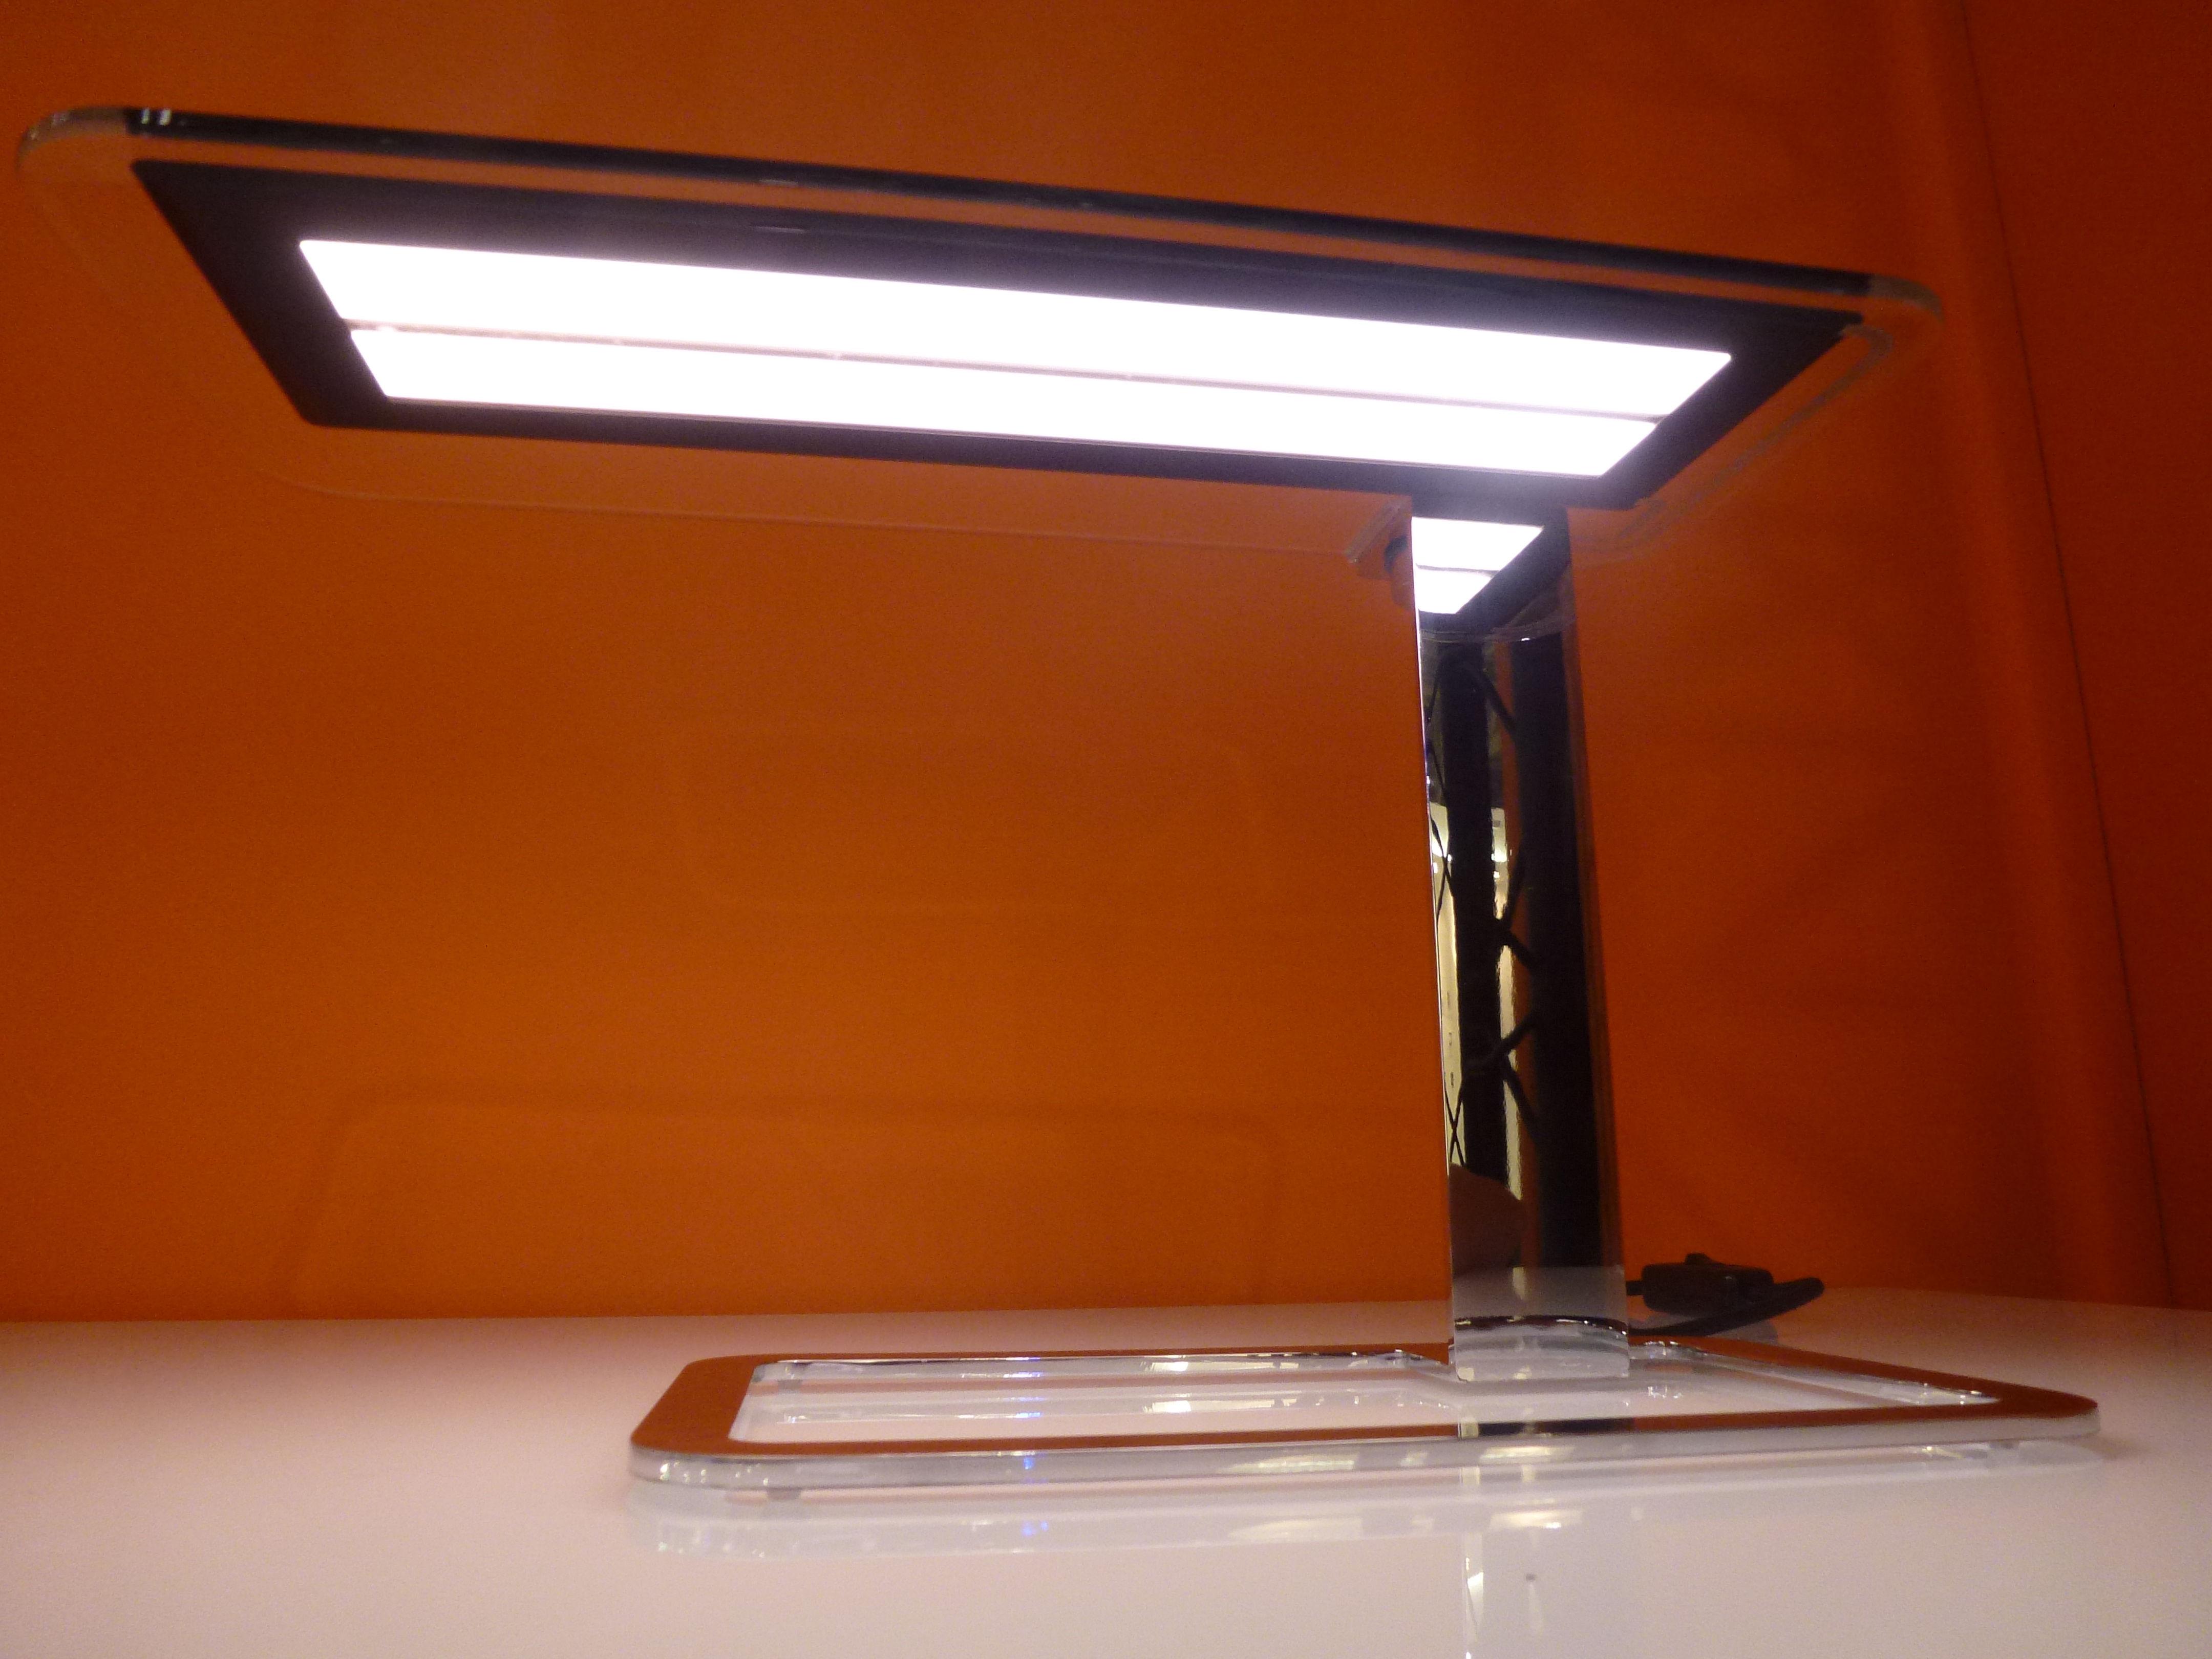 Olé lampada da tavolo tecnologia oled by blackbody nero by made